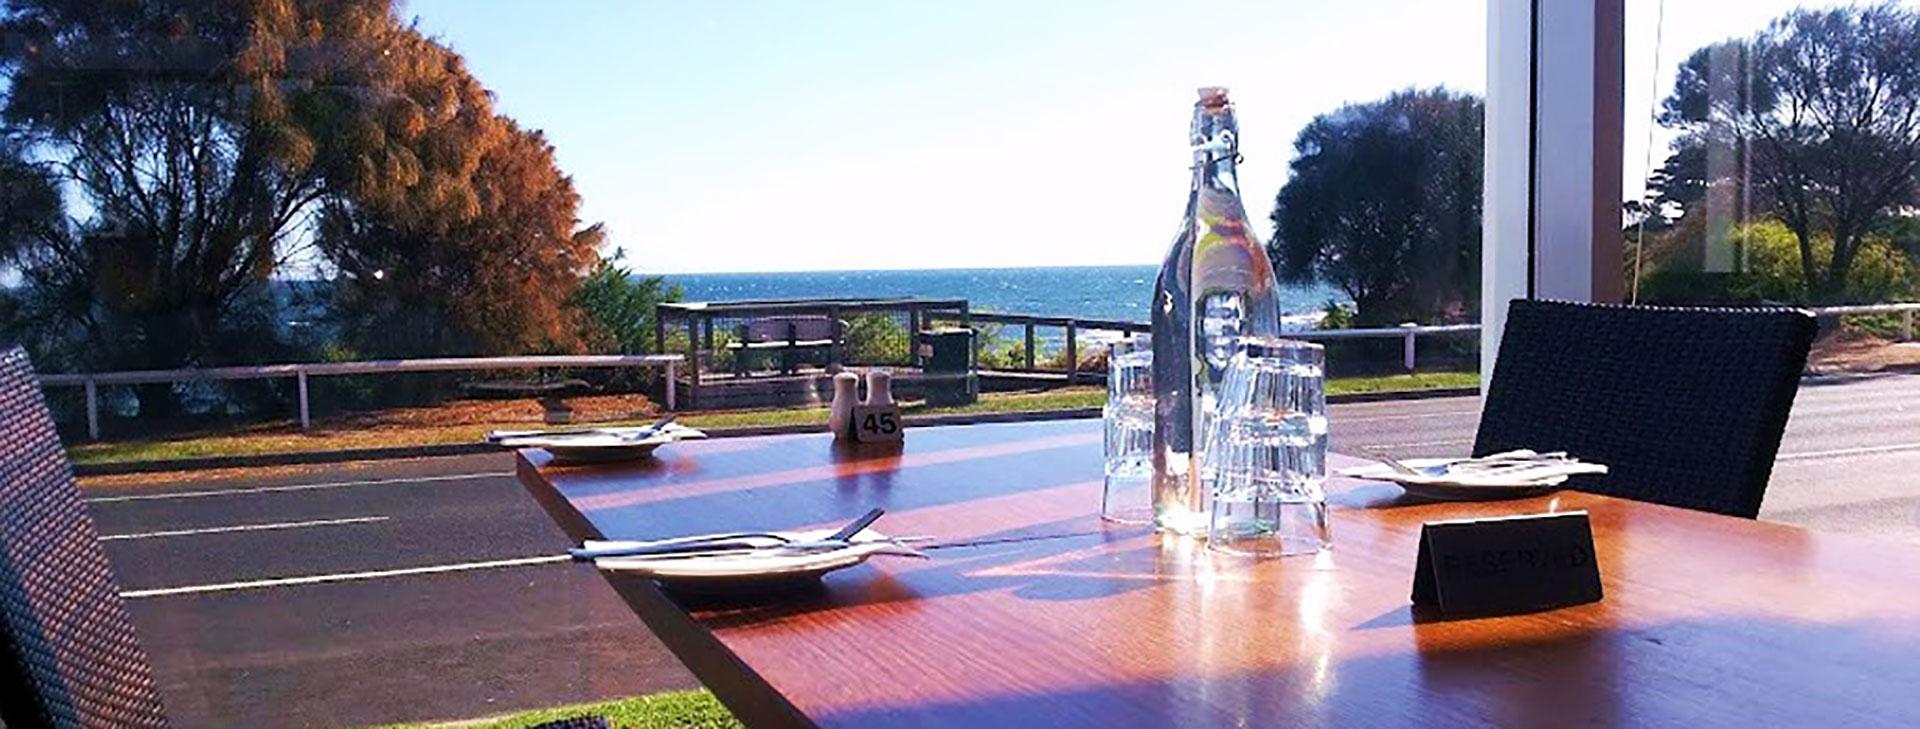 view from Kirks Hotel mornington